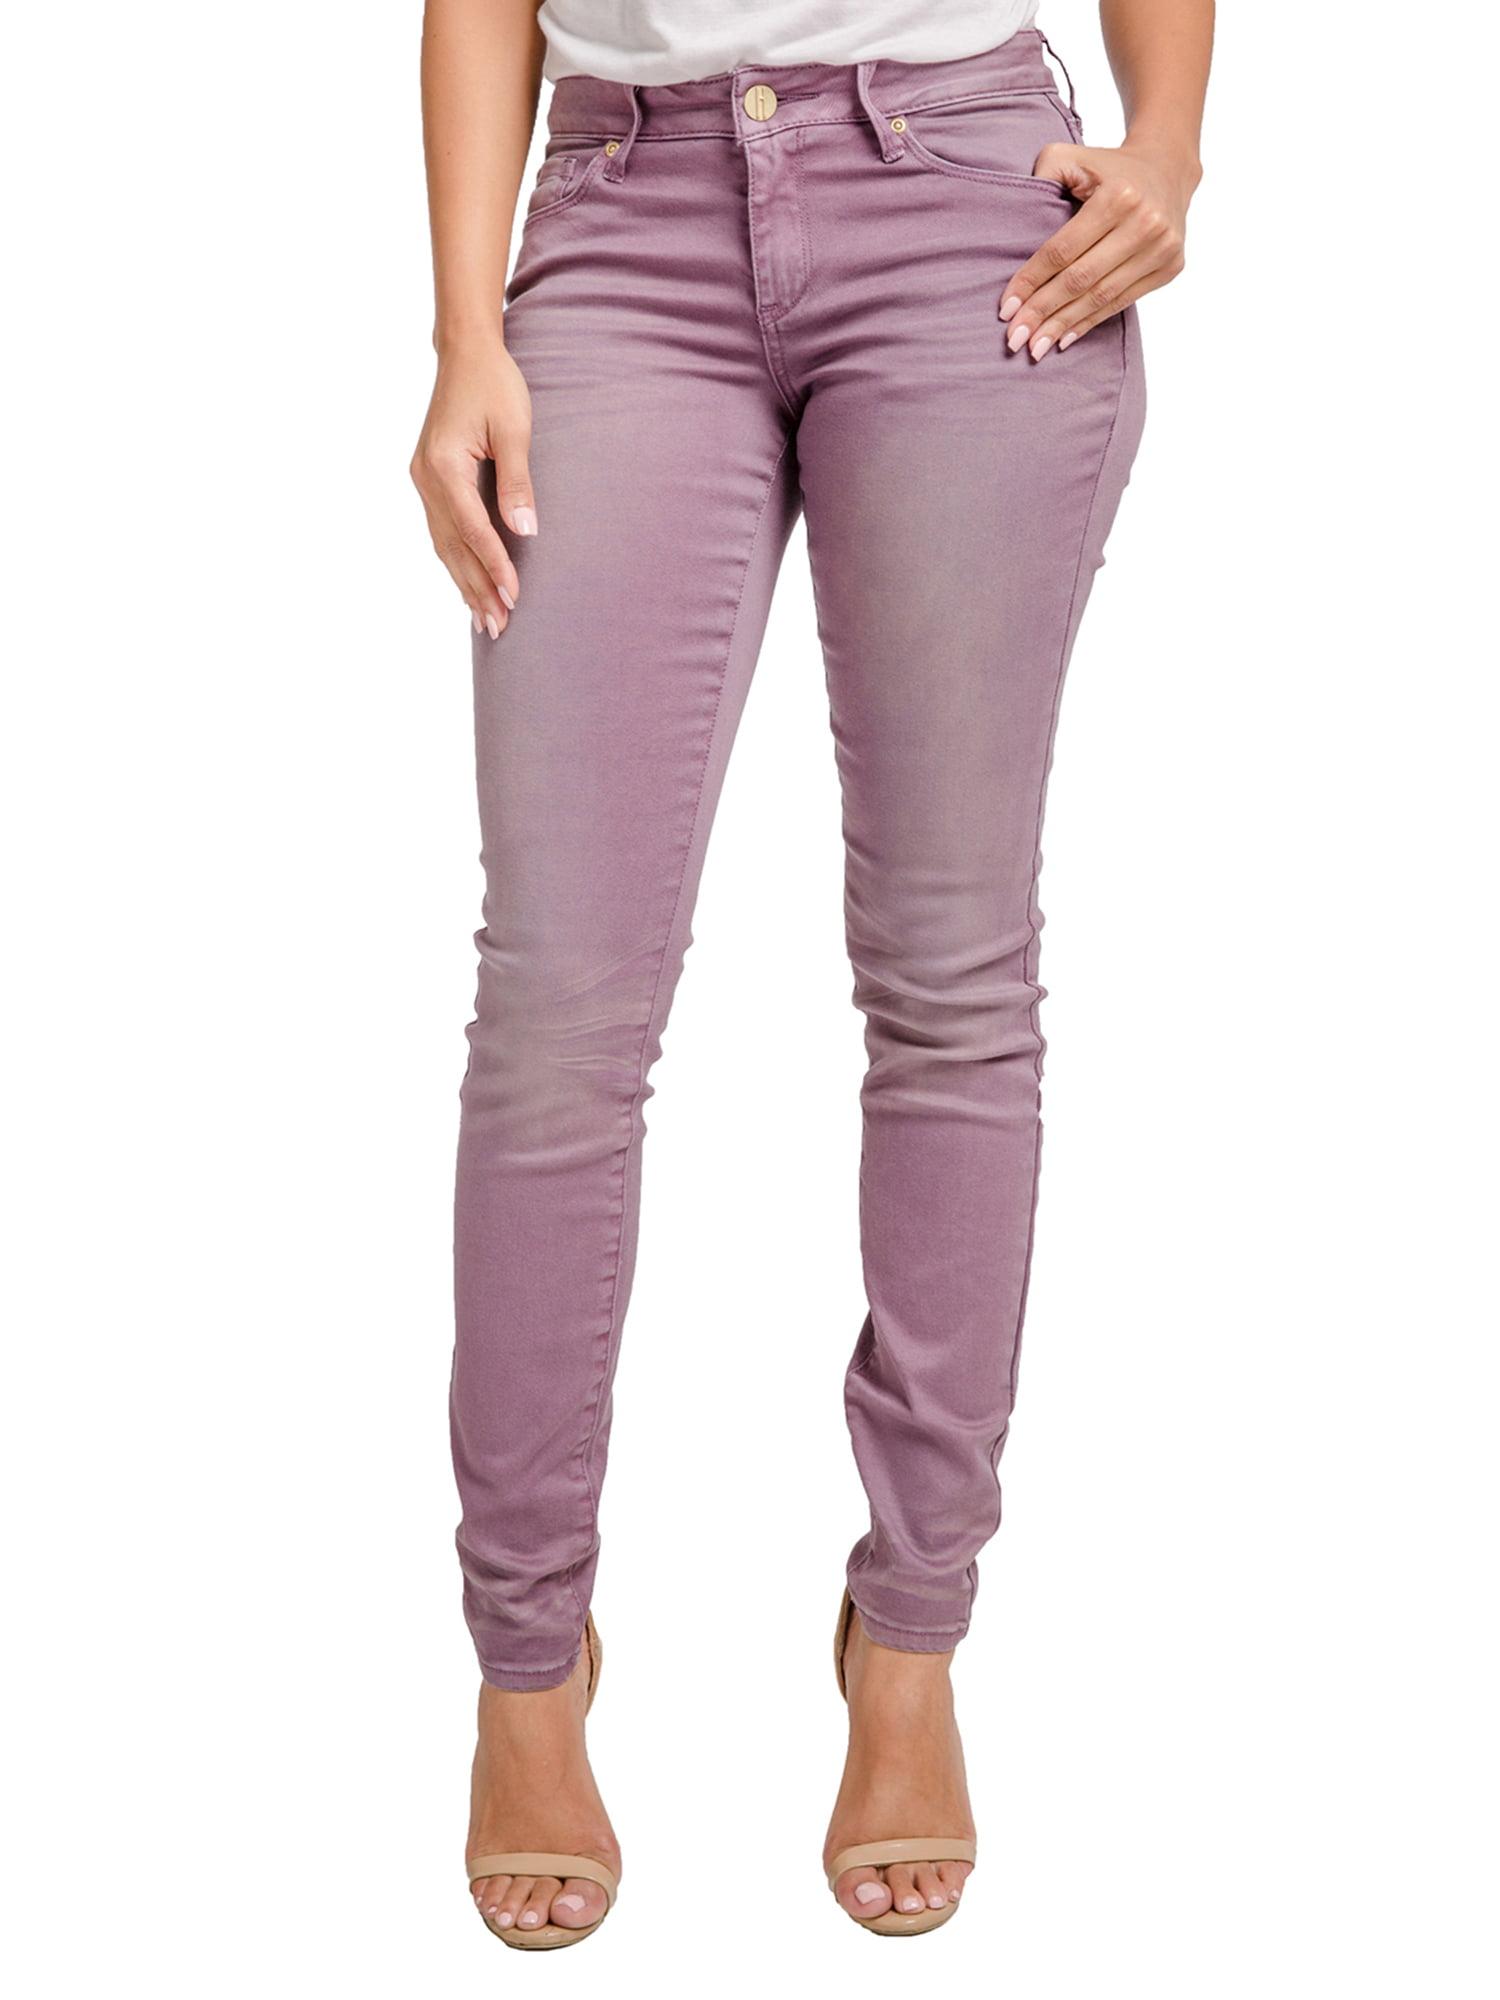 Miss Halladay Womens Plum Color Denim 5 Pocket Skinny Jeans Sand Blasted Wash